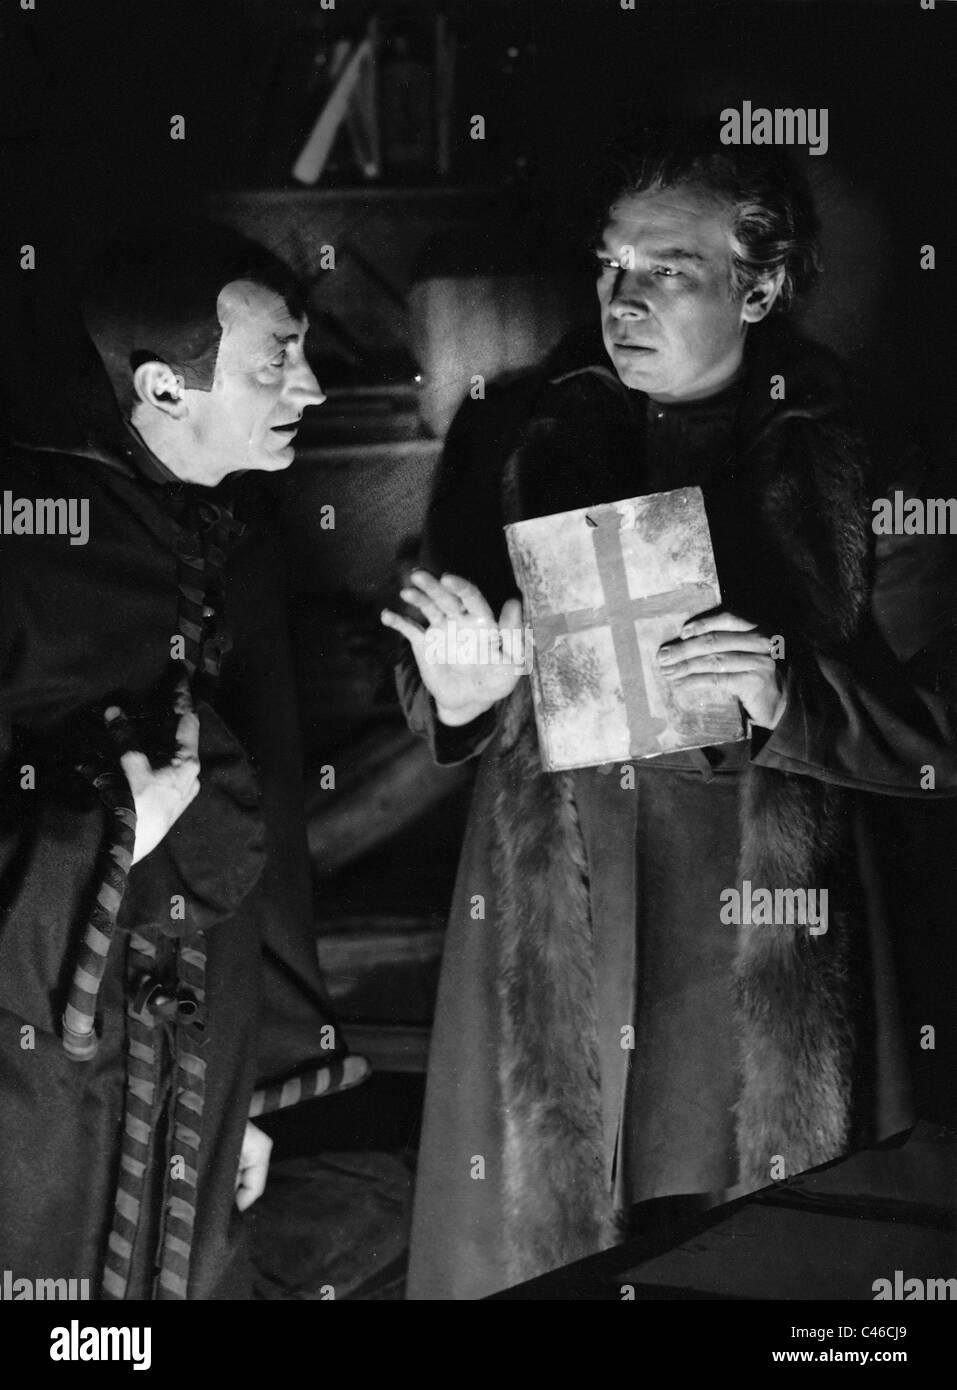 Bruno Huebner and Ewald Balser in 'Faust', 1939 - Stock Image